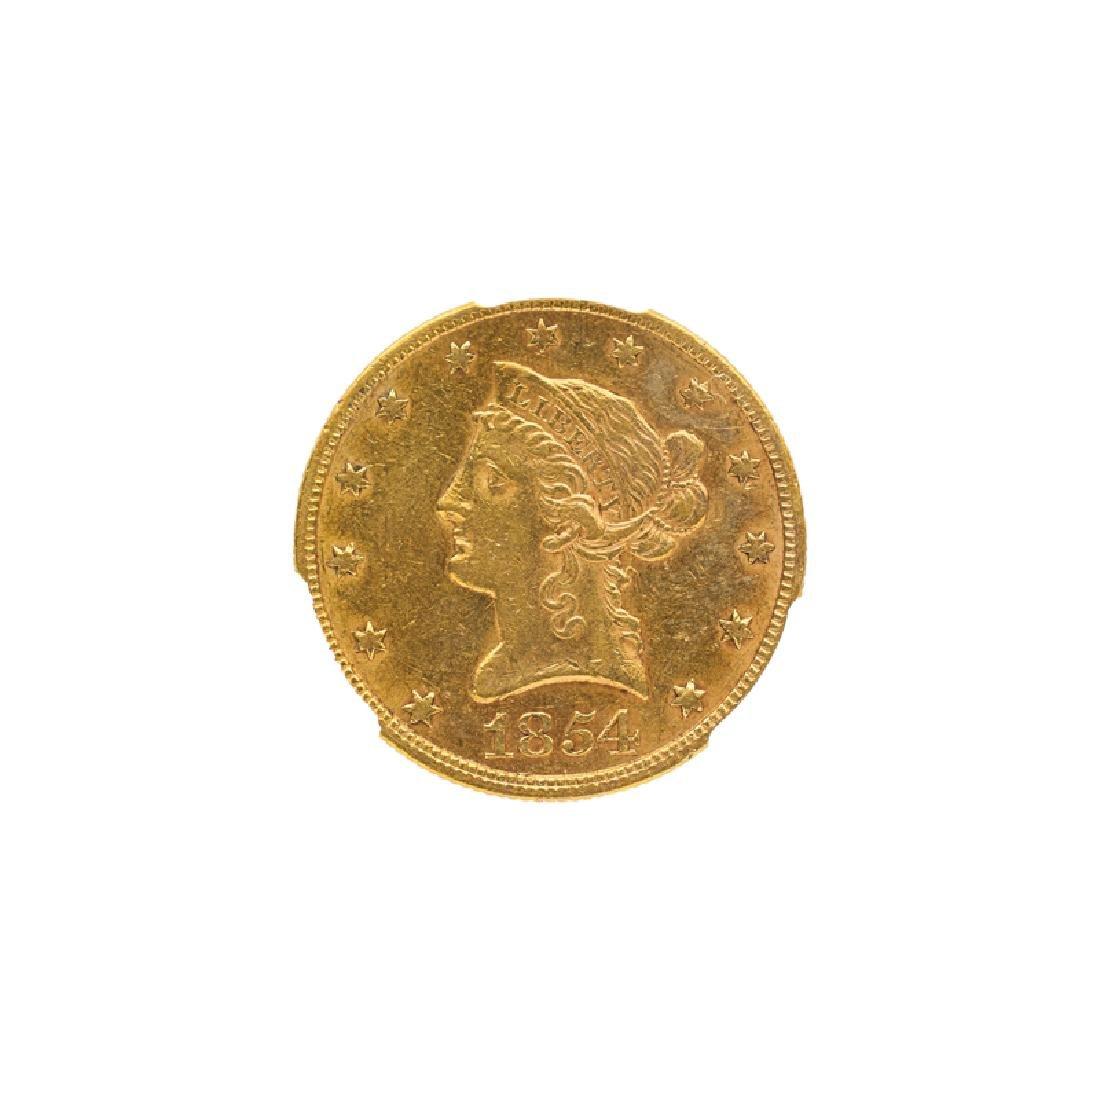 1854 $10.00 LIBERTY HEAD GOLD COIN